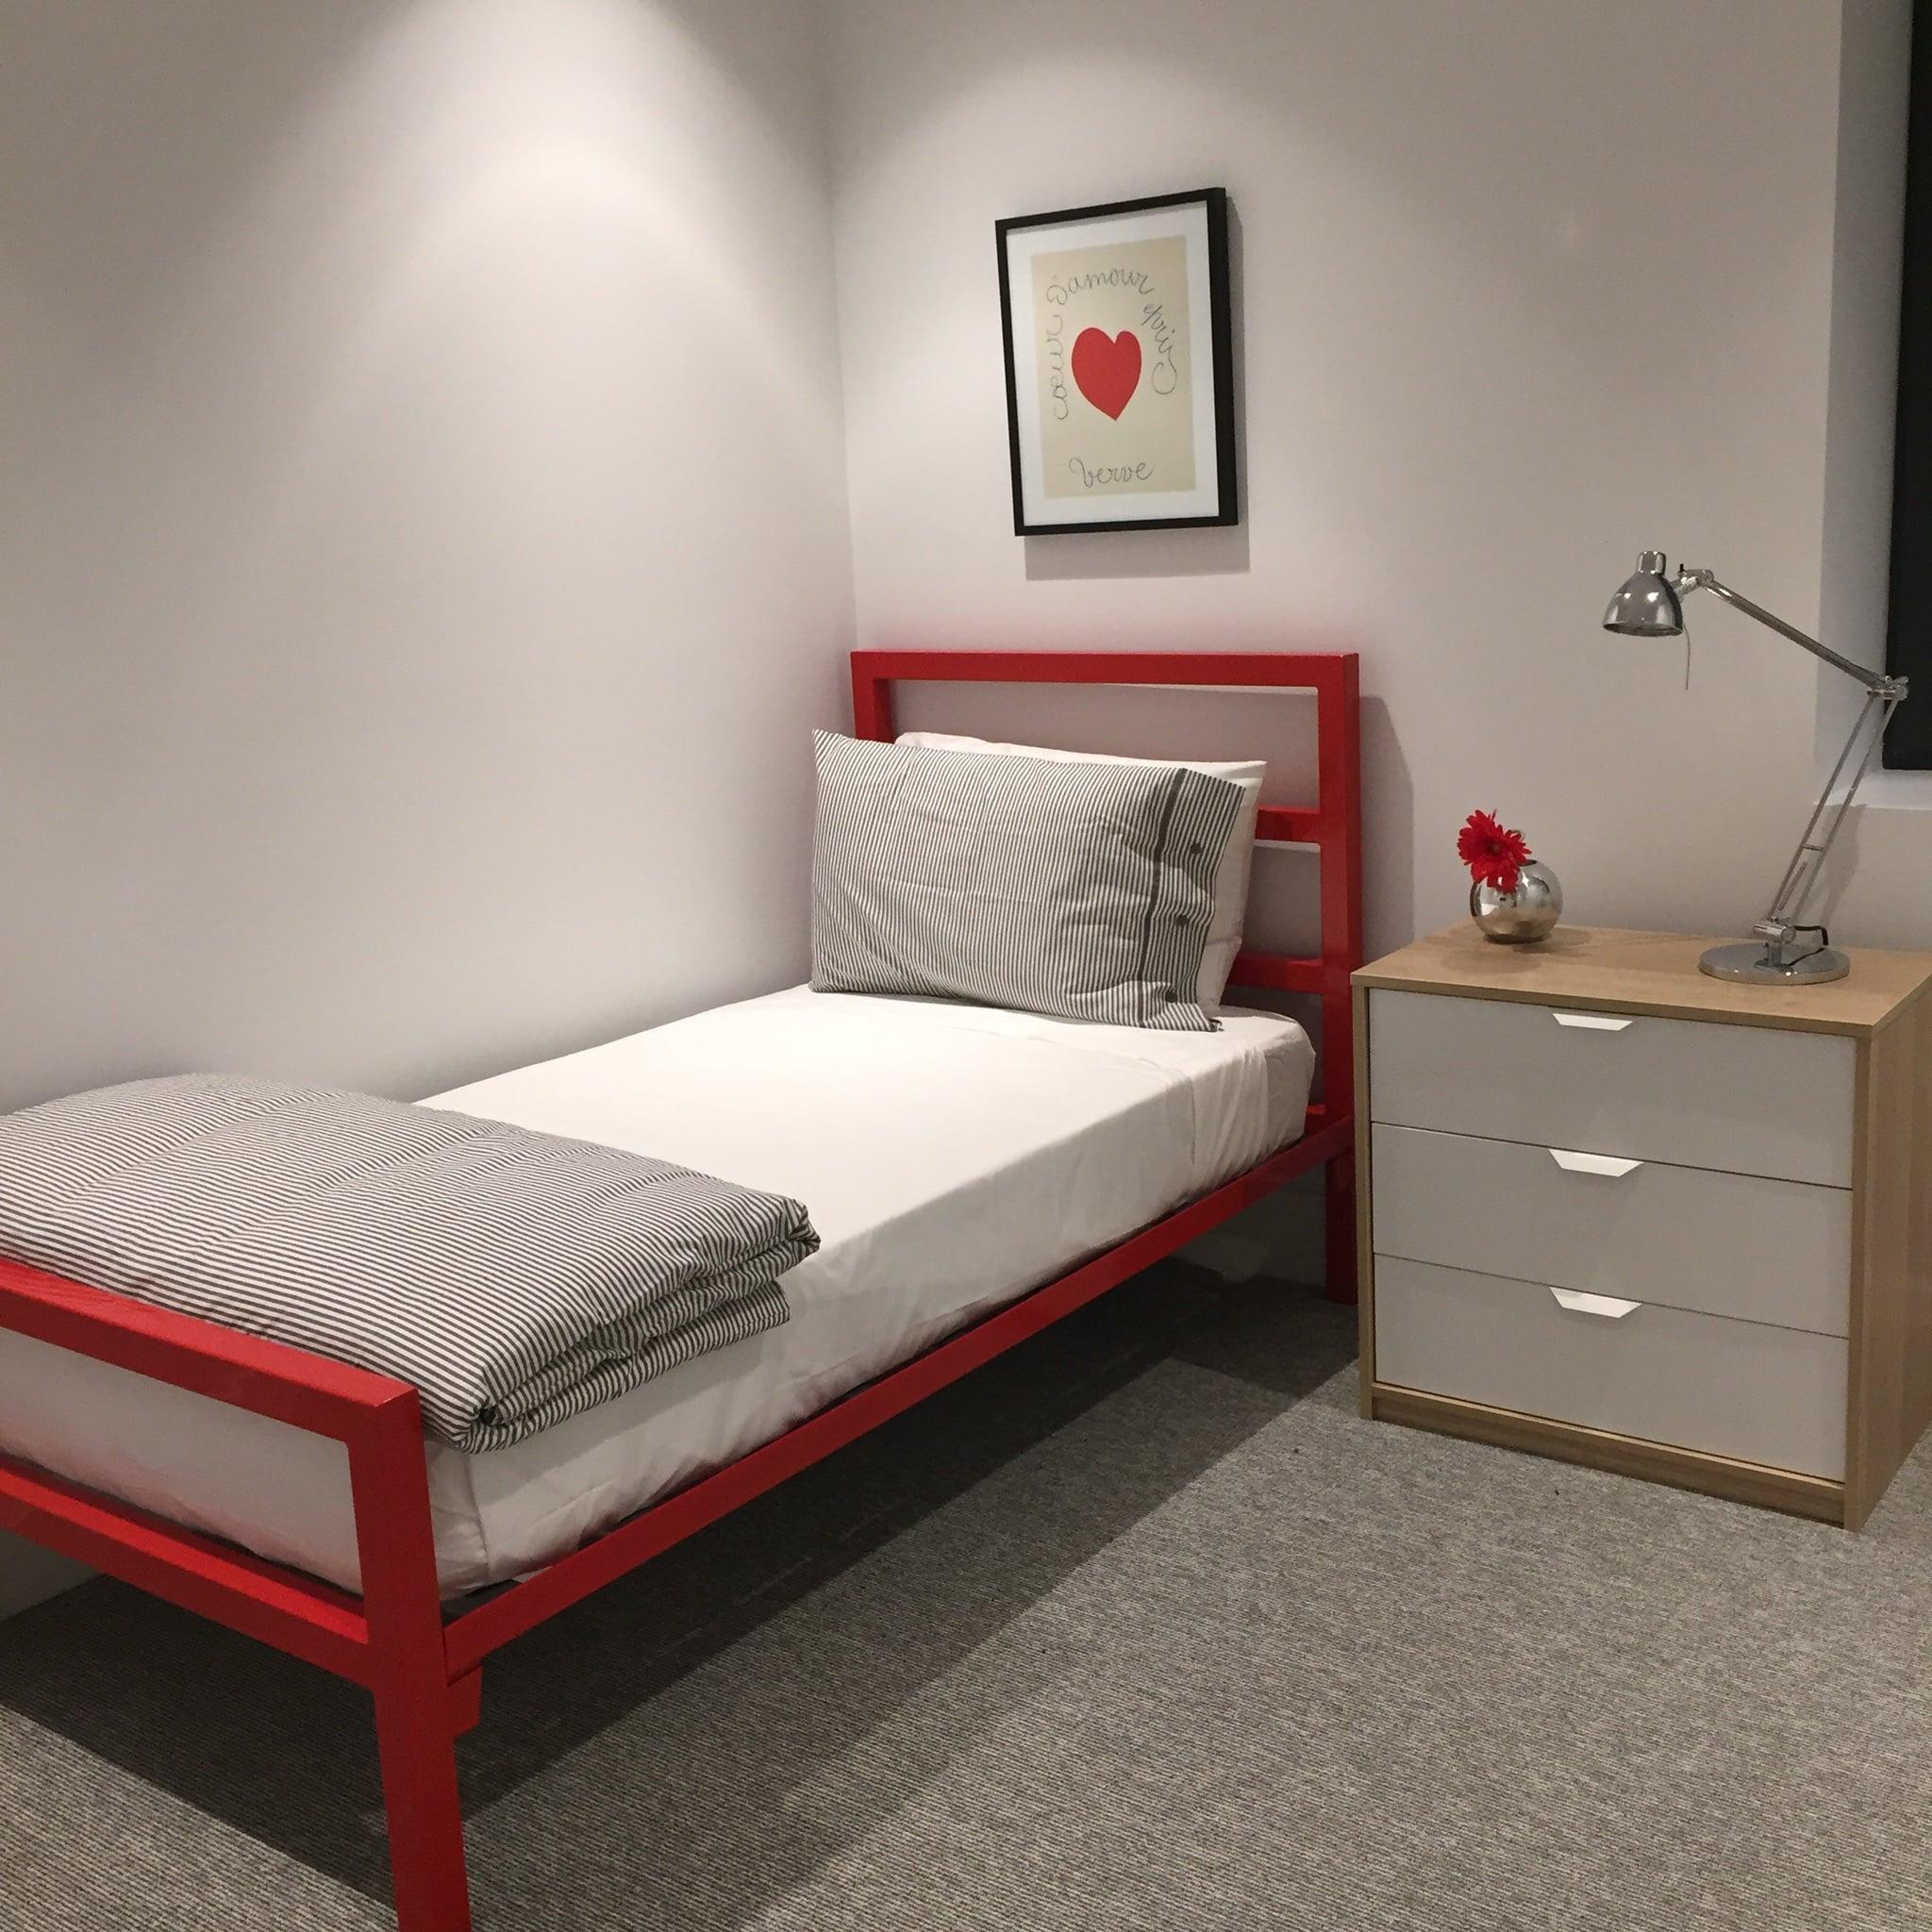 bed wash 1.jpg